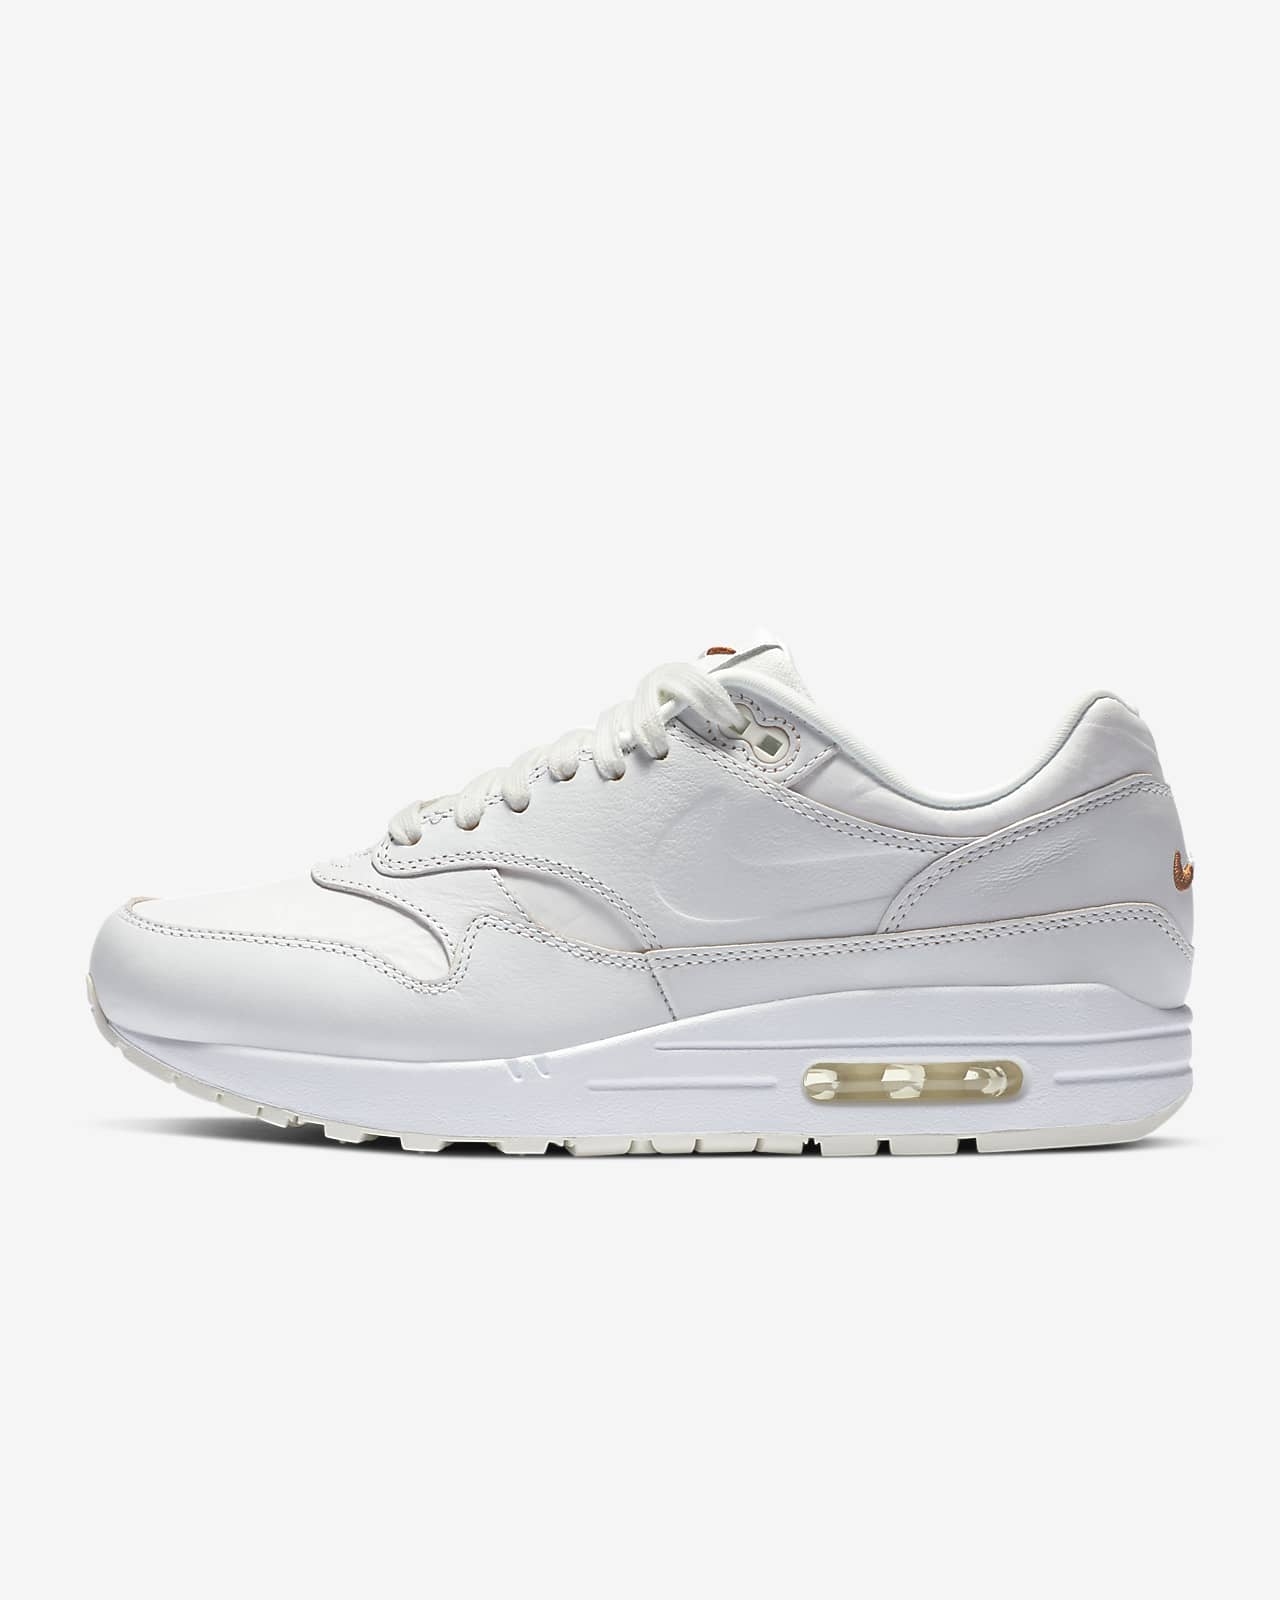 Nike Air Max 1 Women's Shoes. Nike LU